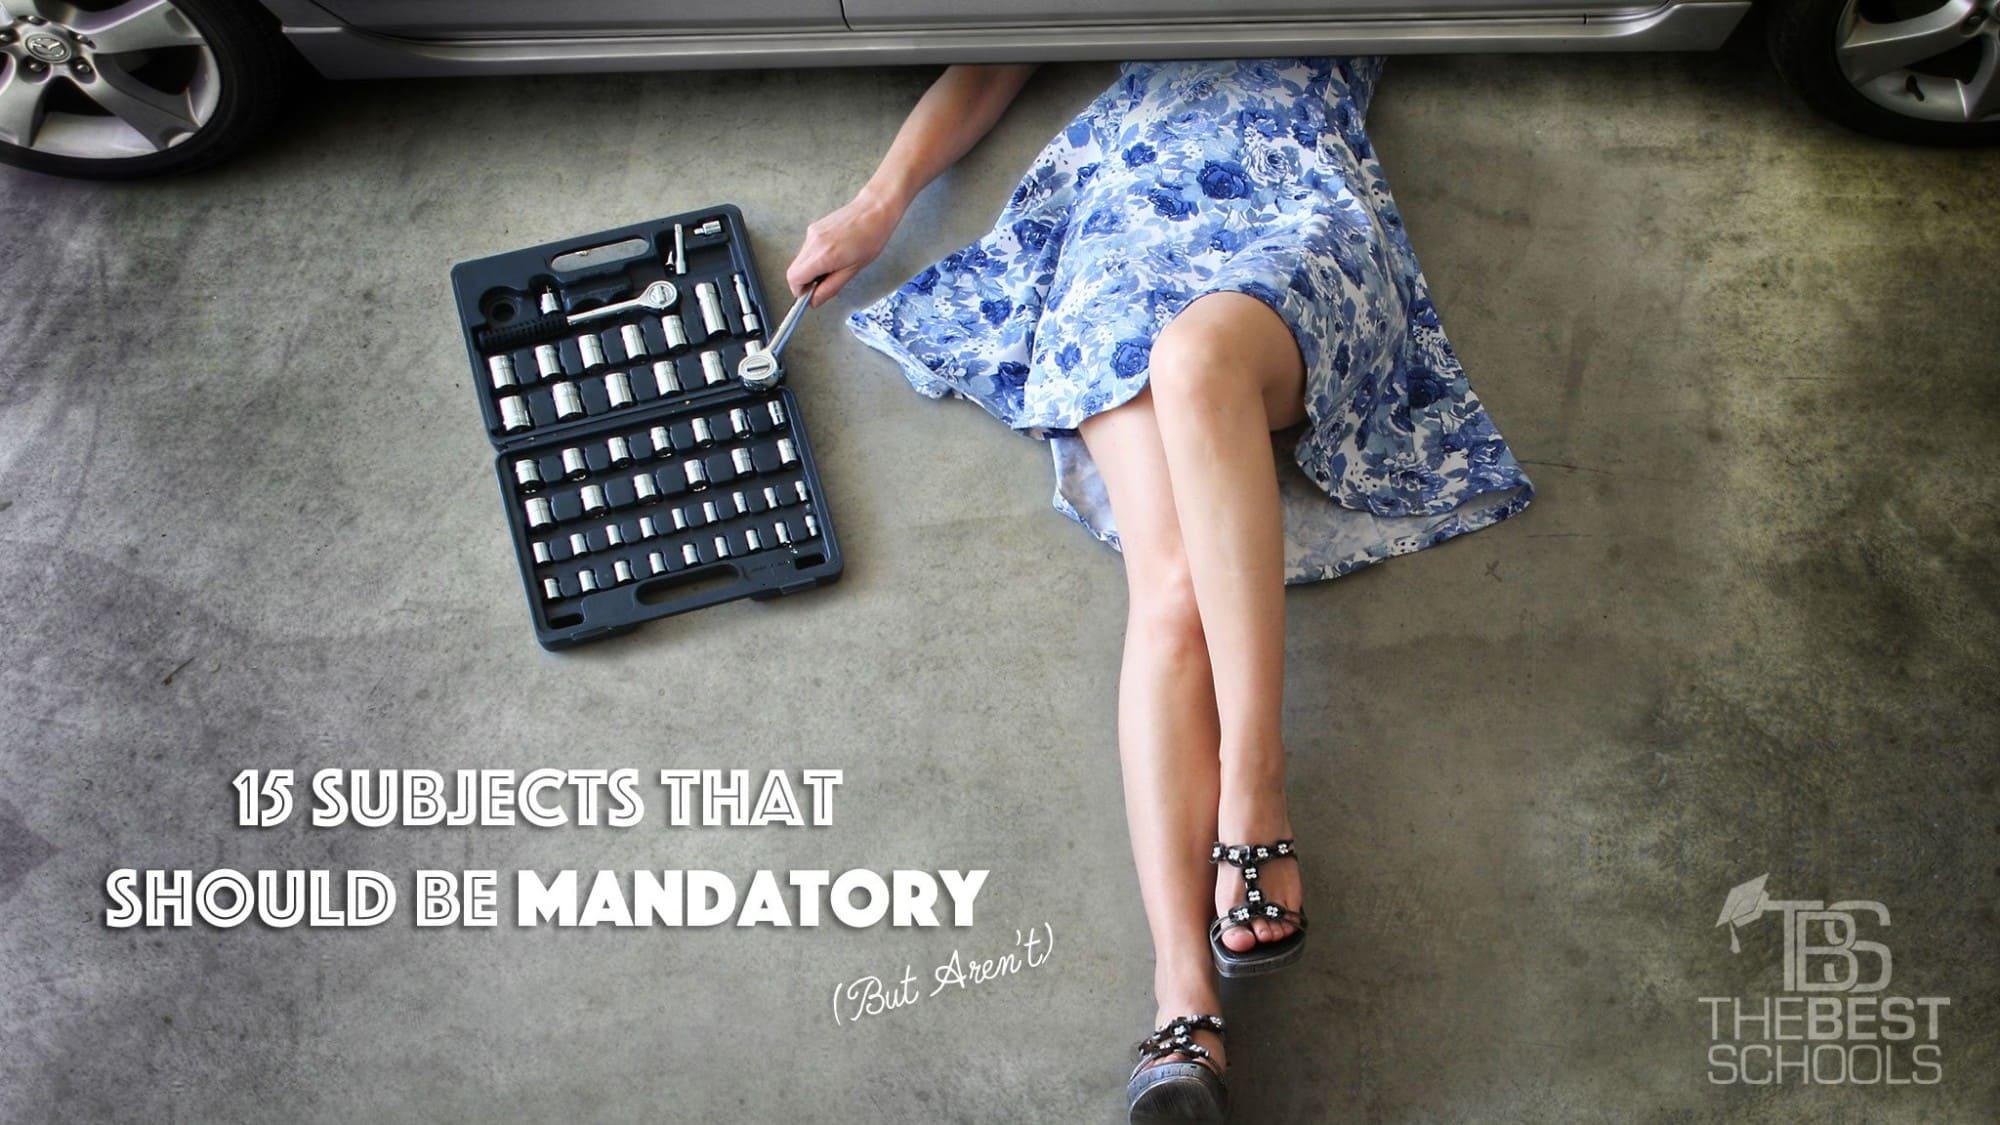 should high school education be mandatory essay